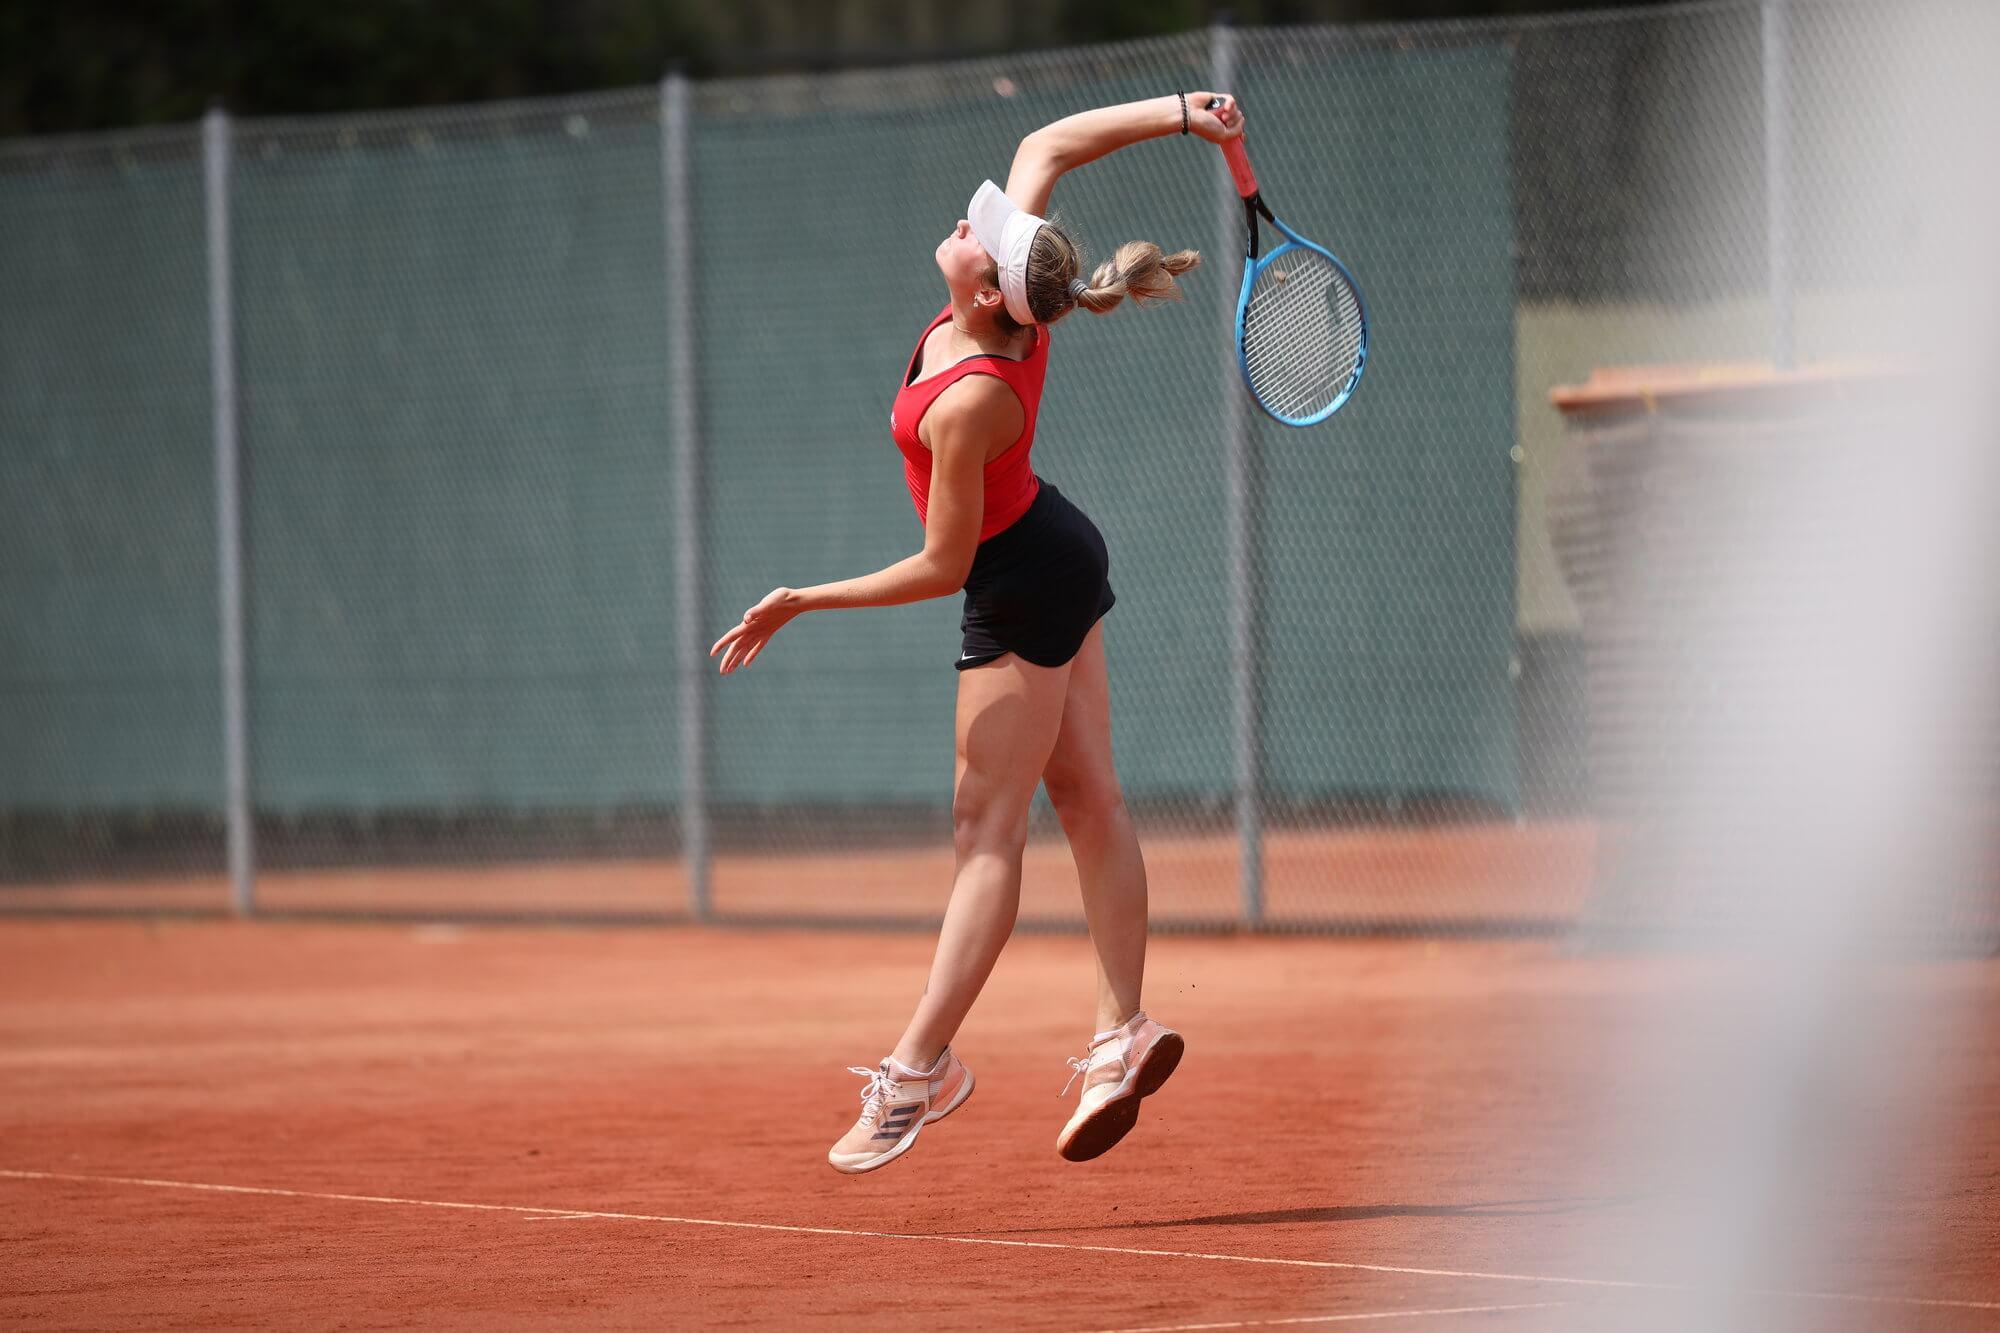 Sportfotograf-Bertram Schaub Photography